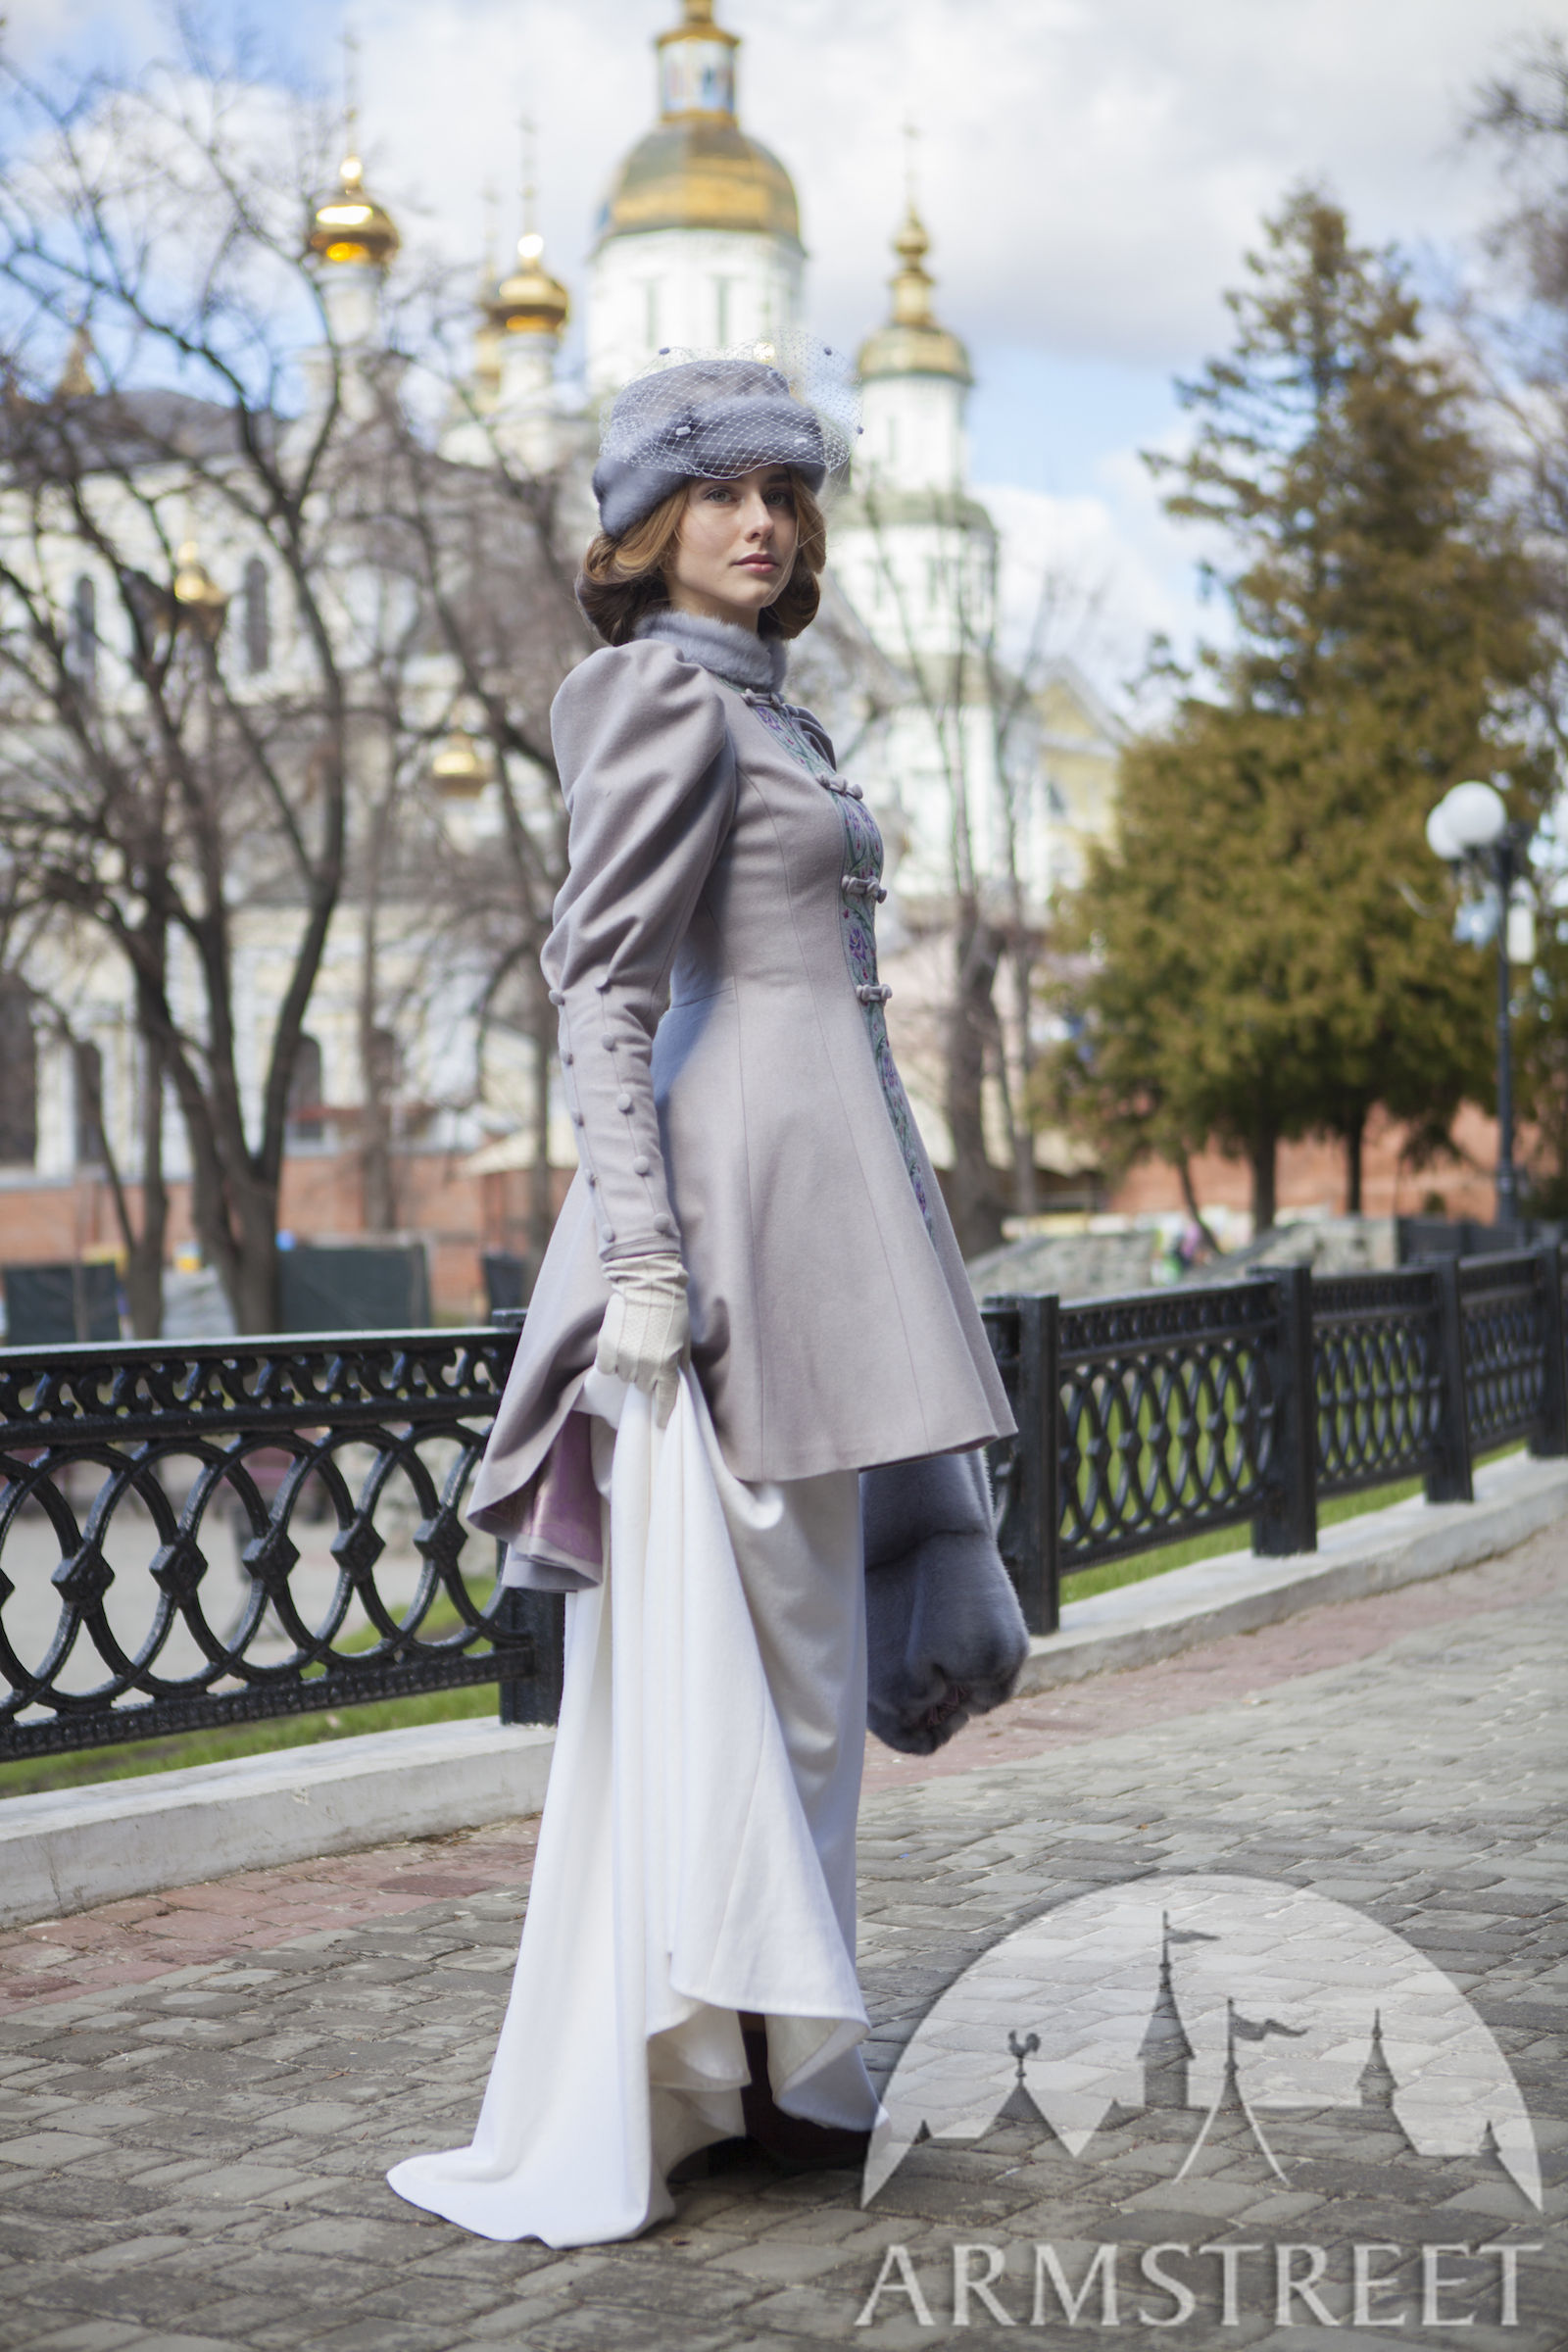 Belle poque Coat FleurdeLis  No embroidery